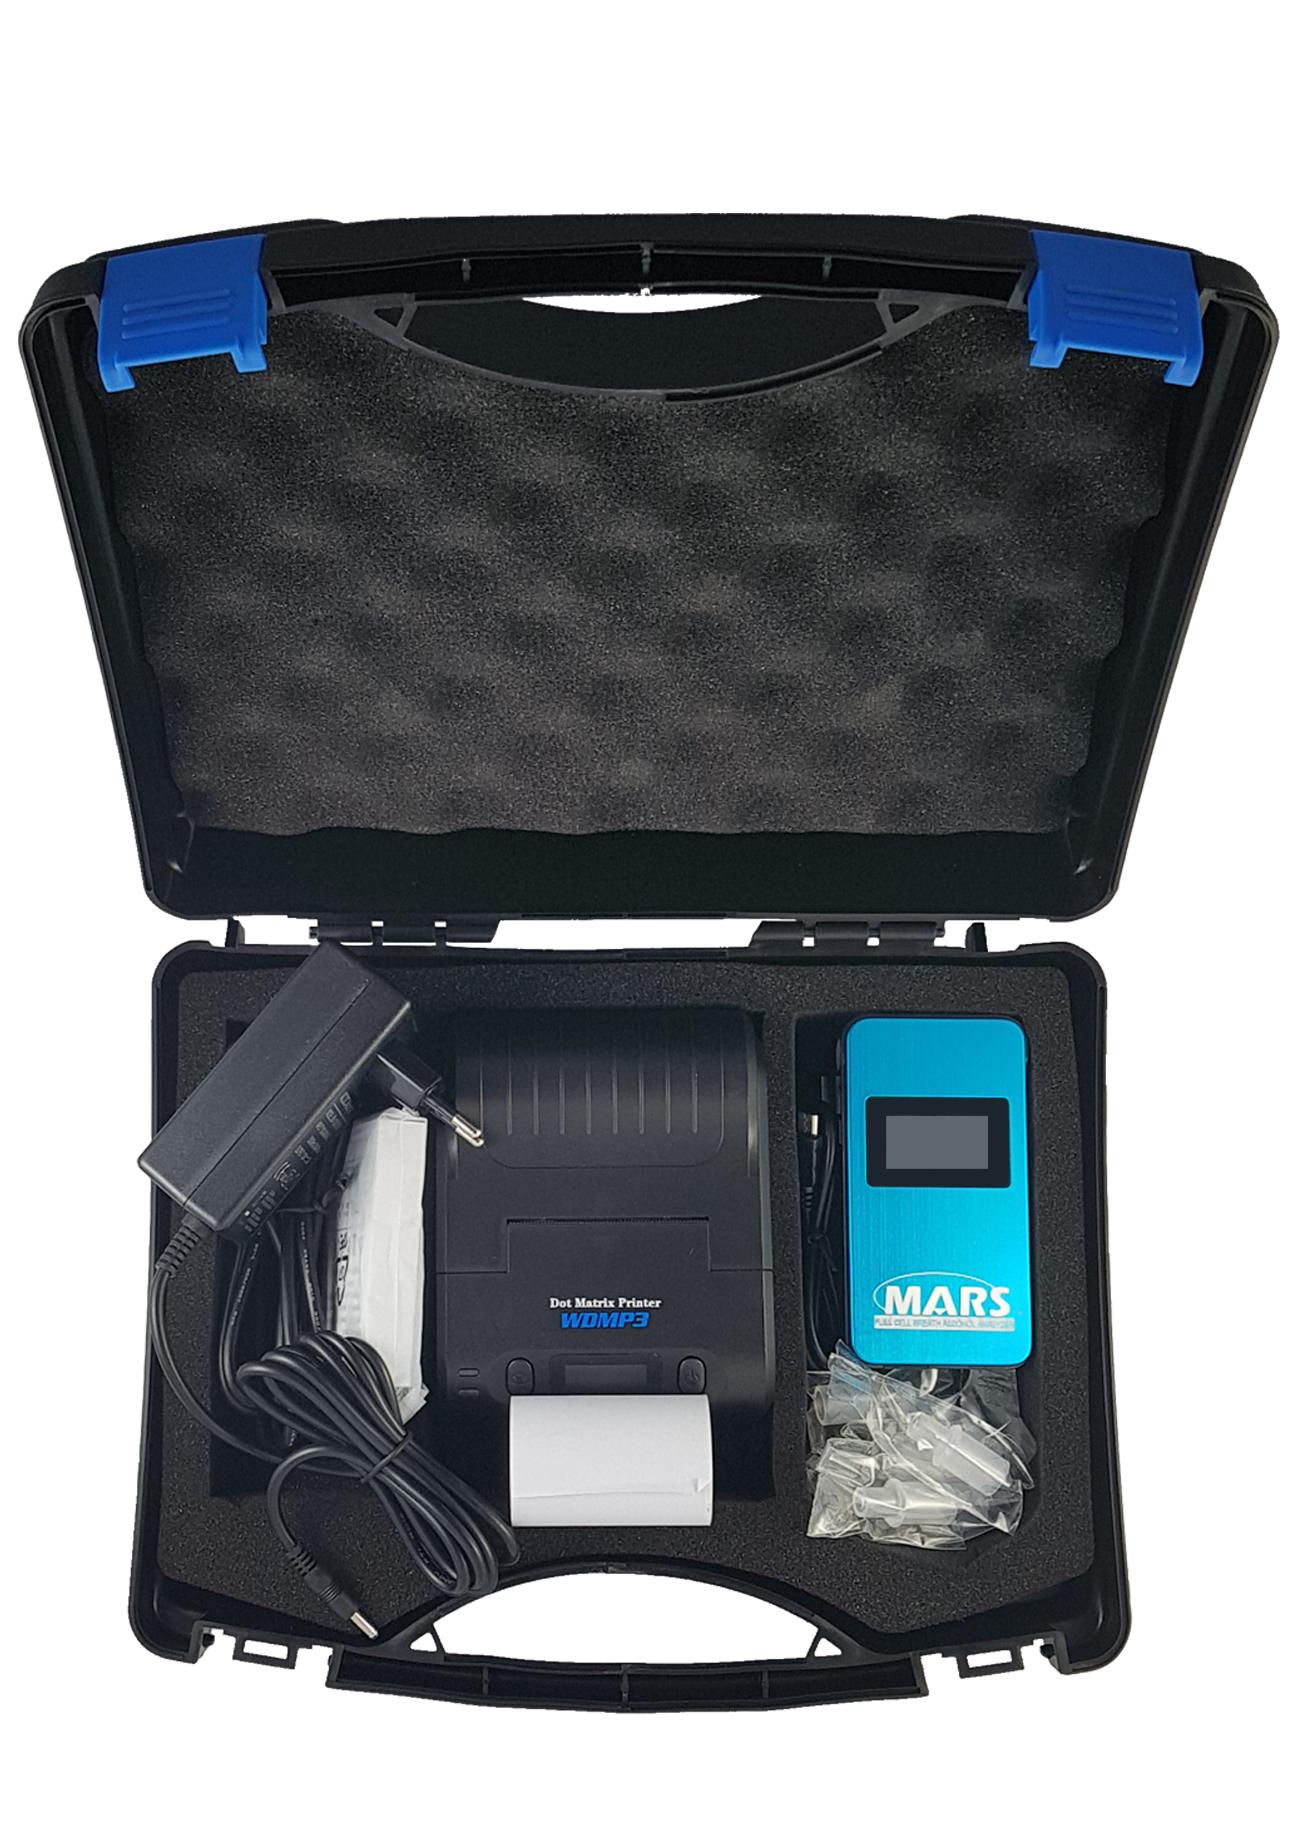 Alcovisor Mars v2 Full Kit + prvotní kalibrace ZDARMA